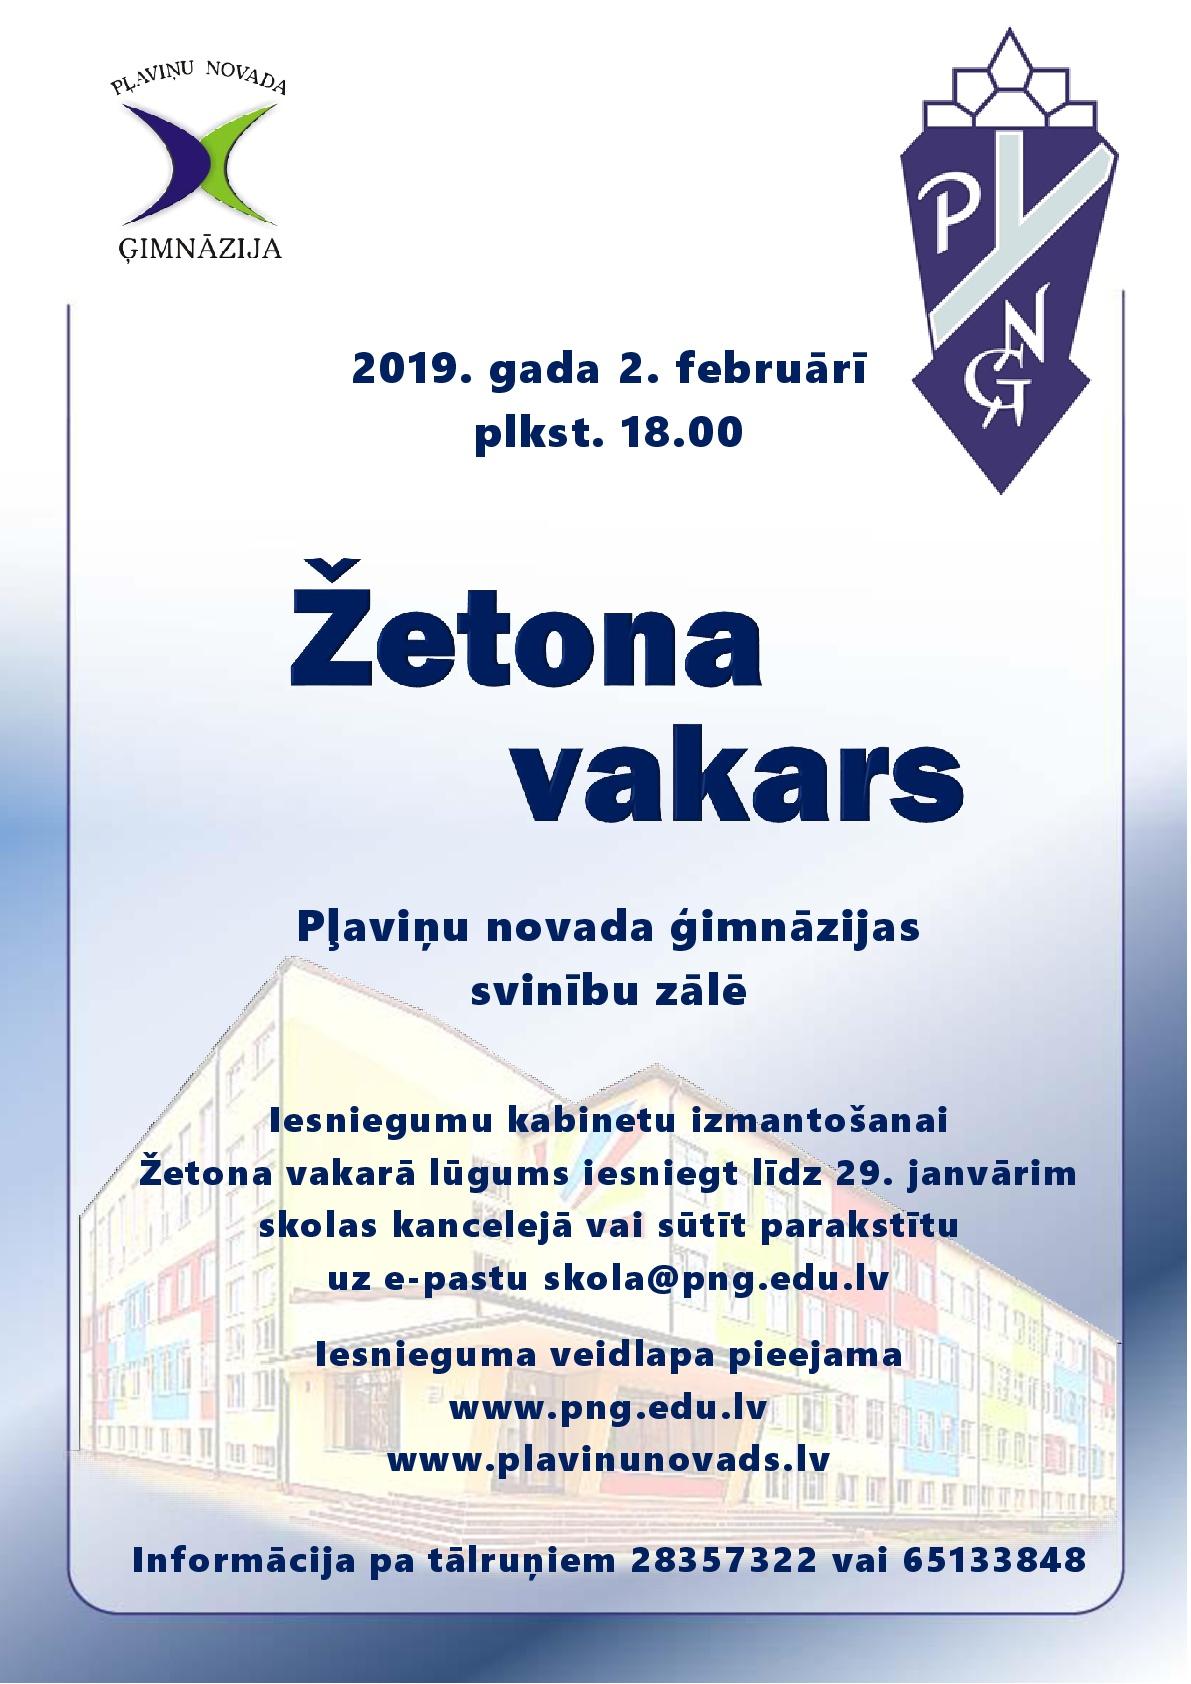 afisa-zetona-vakars-2019